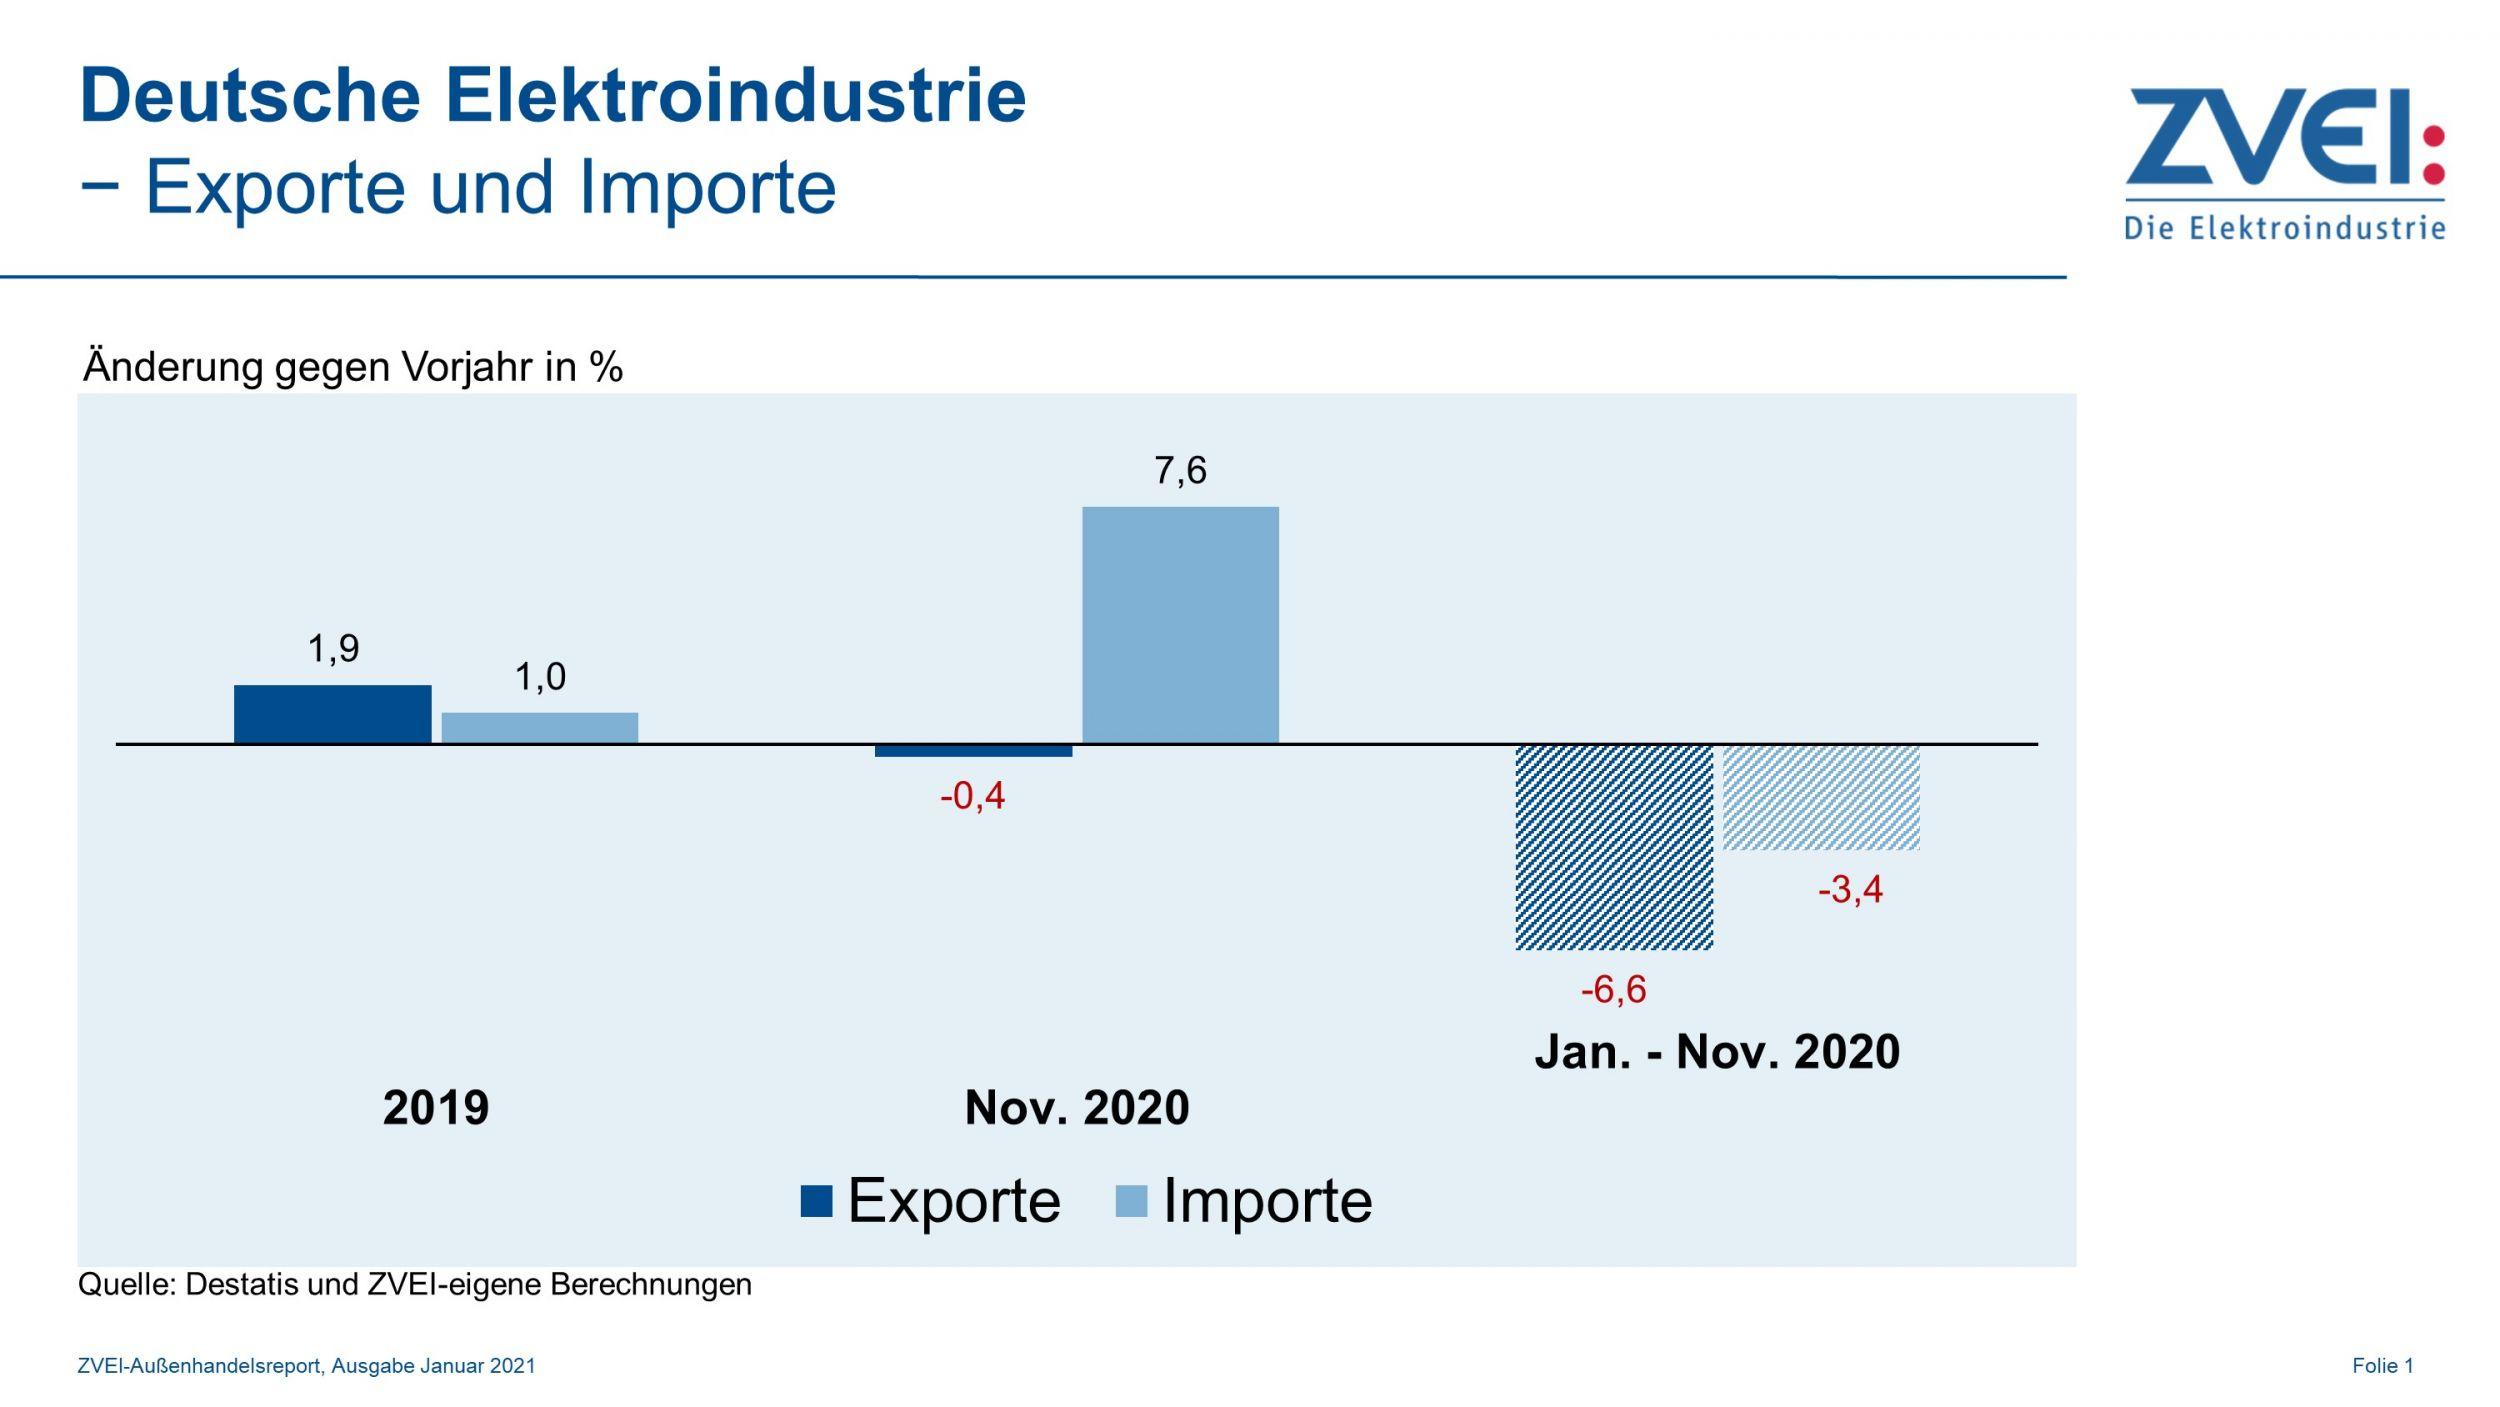 Elektroexporte zuletzt noch immer leicht rückläufig